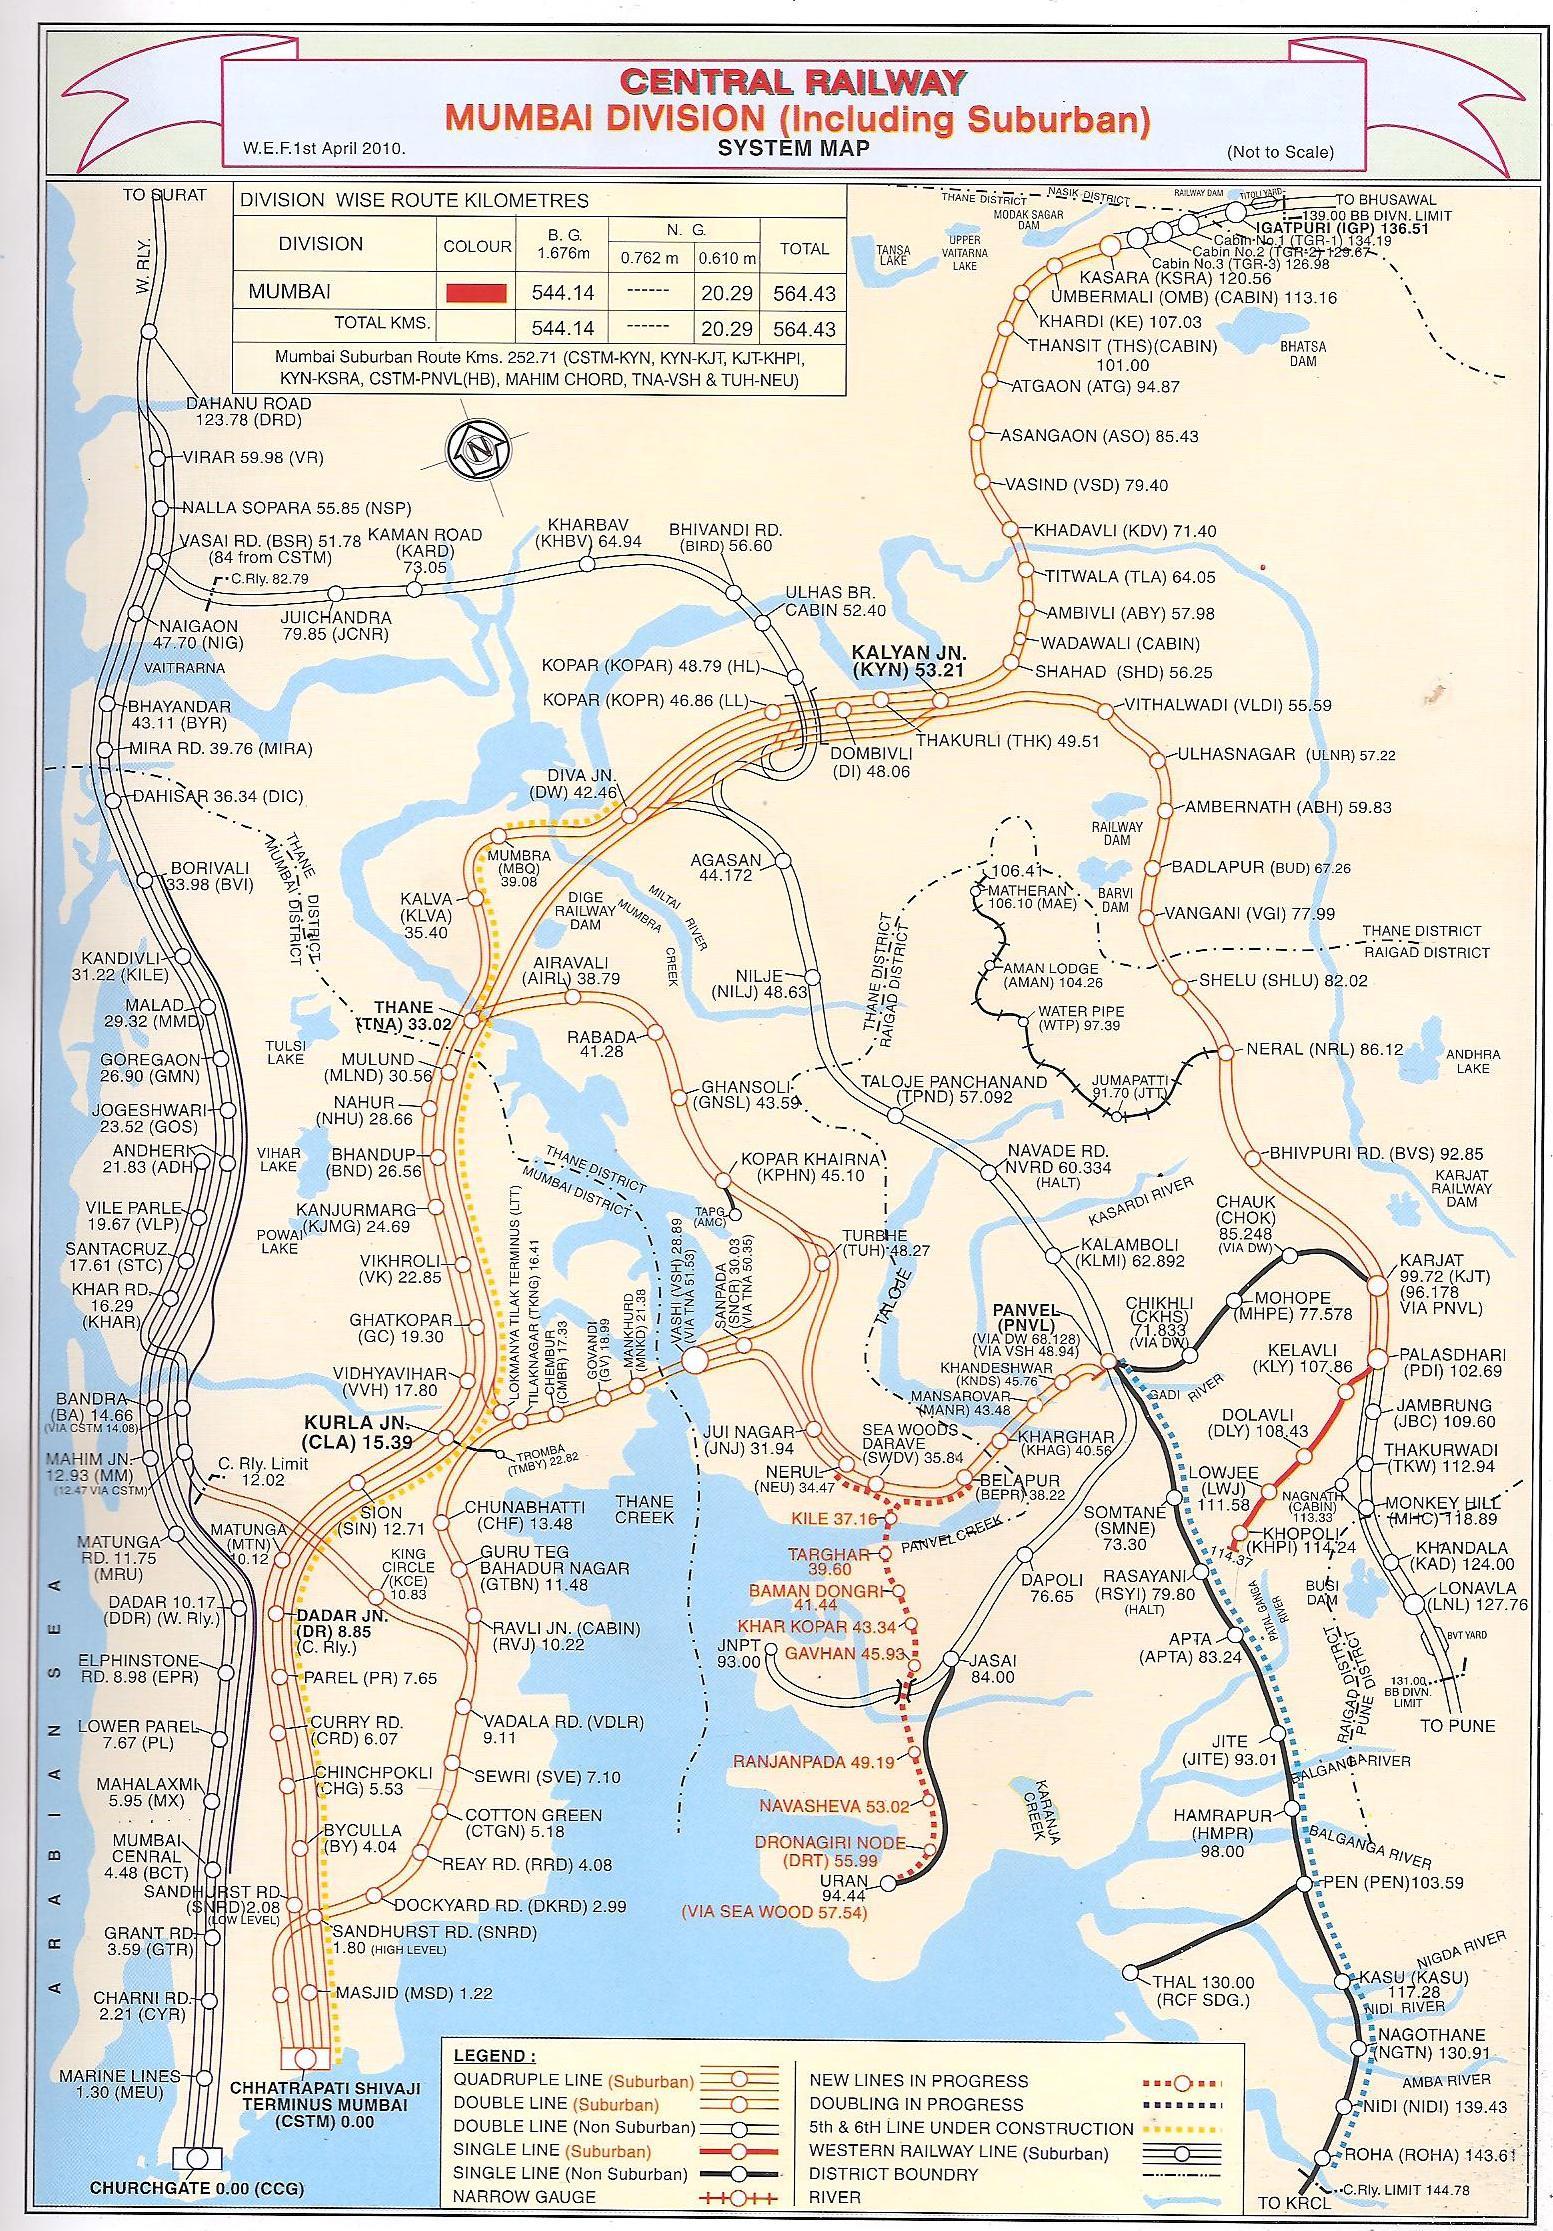 Central Railway / Indian Railways Portal